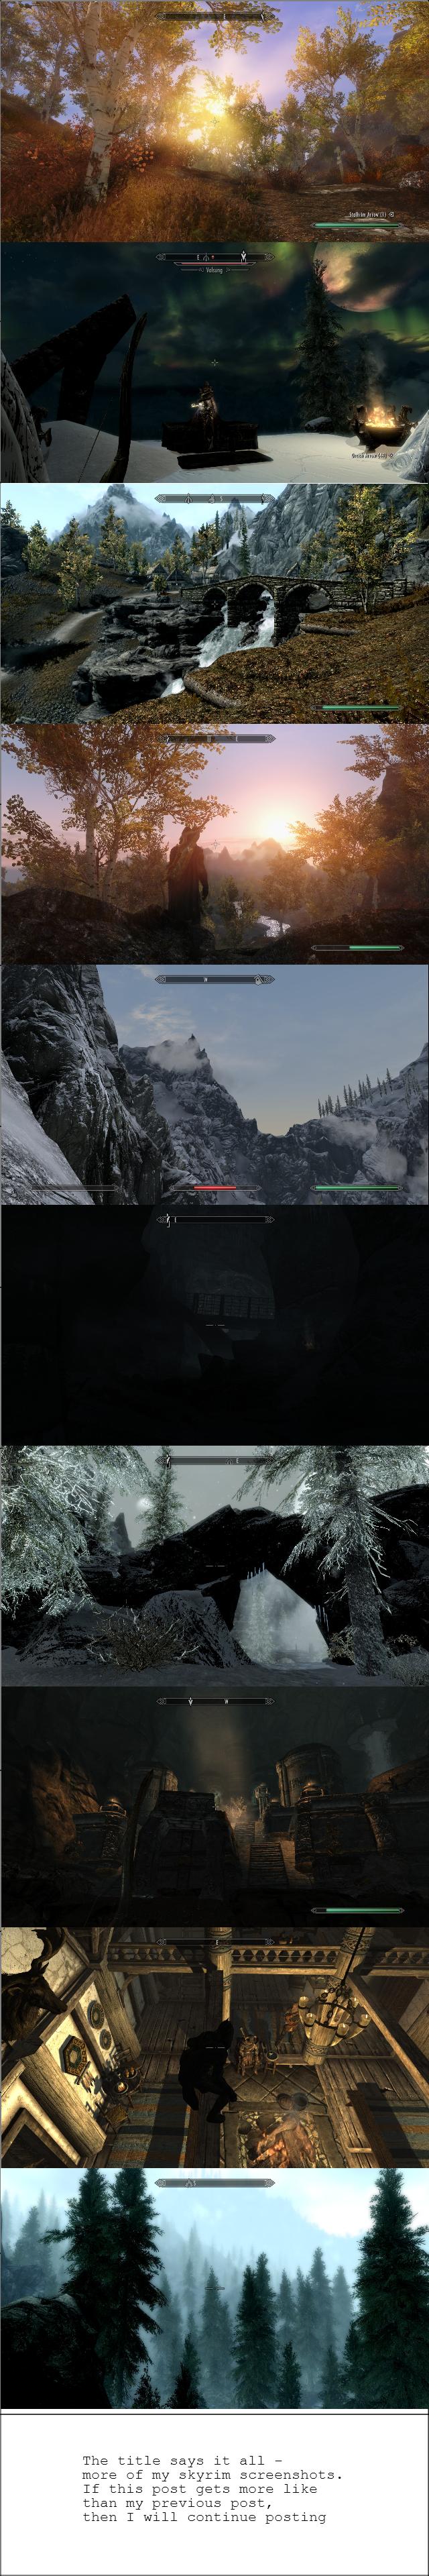 More modded Skyrim screenshots. Part 2 of my collection of Skyrim screenshots. I run quite alot of mods. Mod list: IncreasedGrassDensity StaticMeshImprovement S